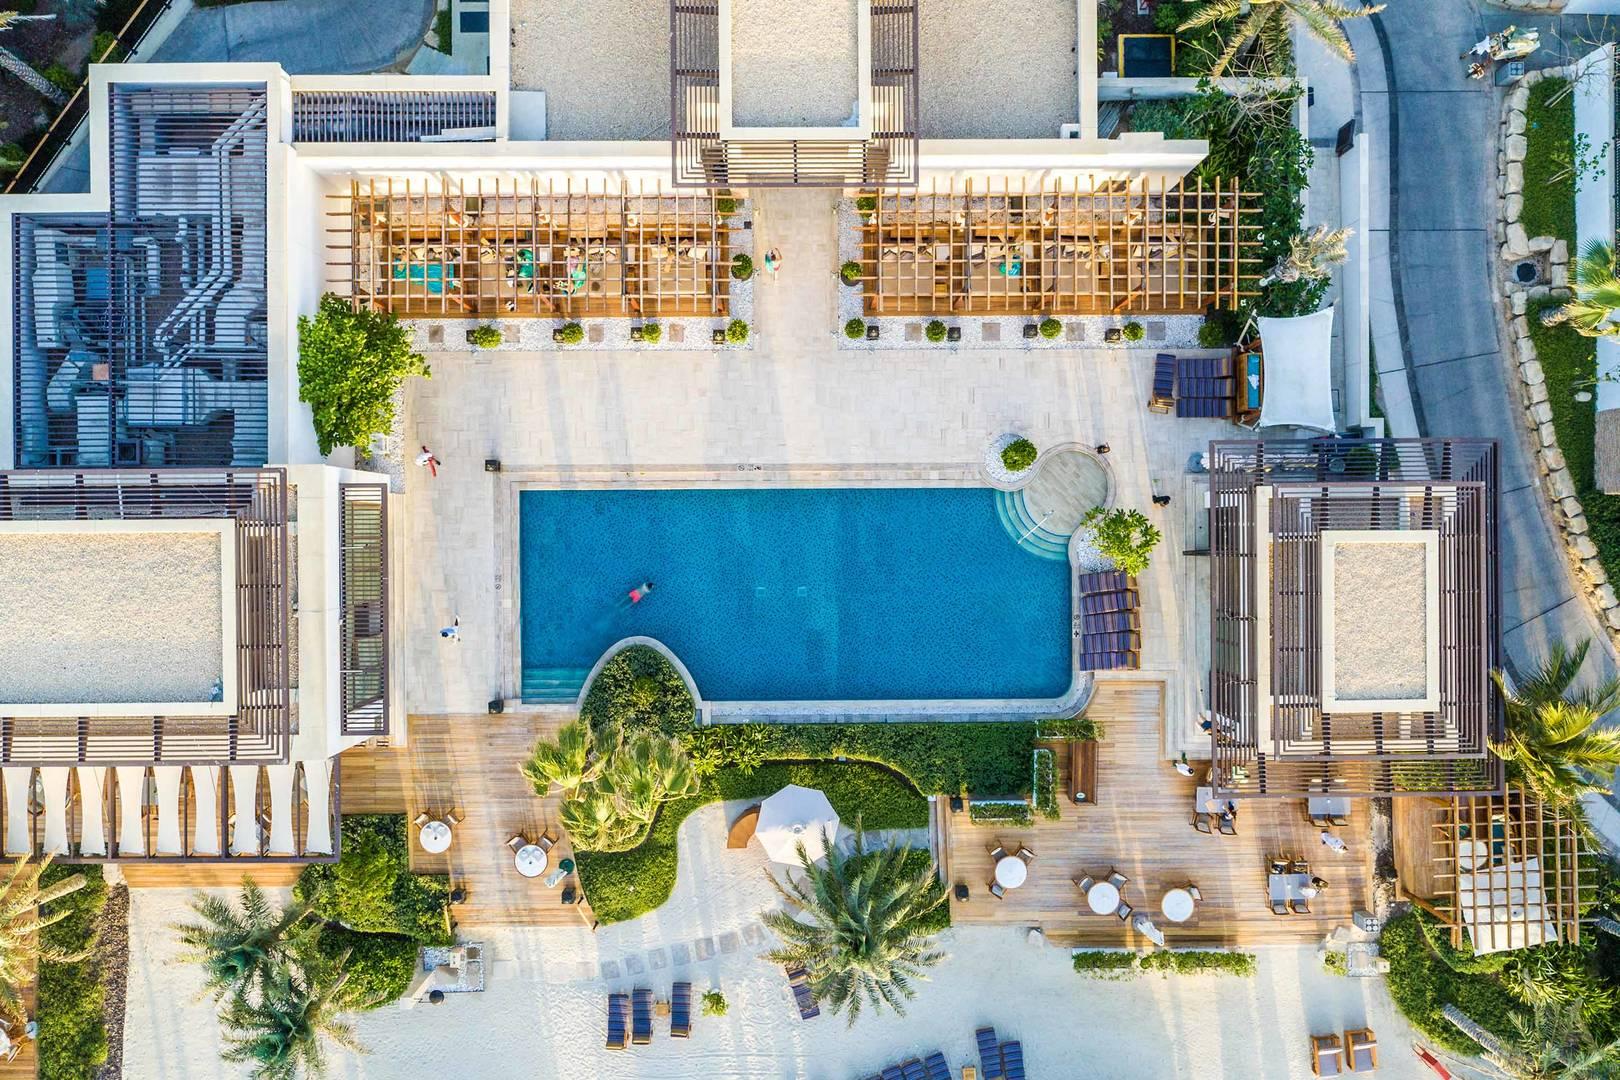 https://cdn.jumeirah.com/-/mediadh/DH/Hospitality/Jumeirah/Restaurants/Dubai/Al-Naseem-Summersalt/Restaurant-Gallery/JumeirahAlNaseemSummersaltBeachClubAerialDrone64.jpg?h=1080&w=1620&hash=ED644DDF8E001986CFAD204D97D78581